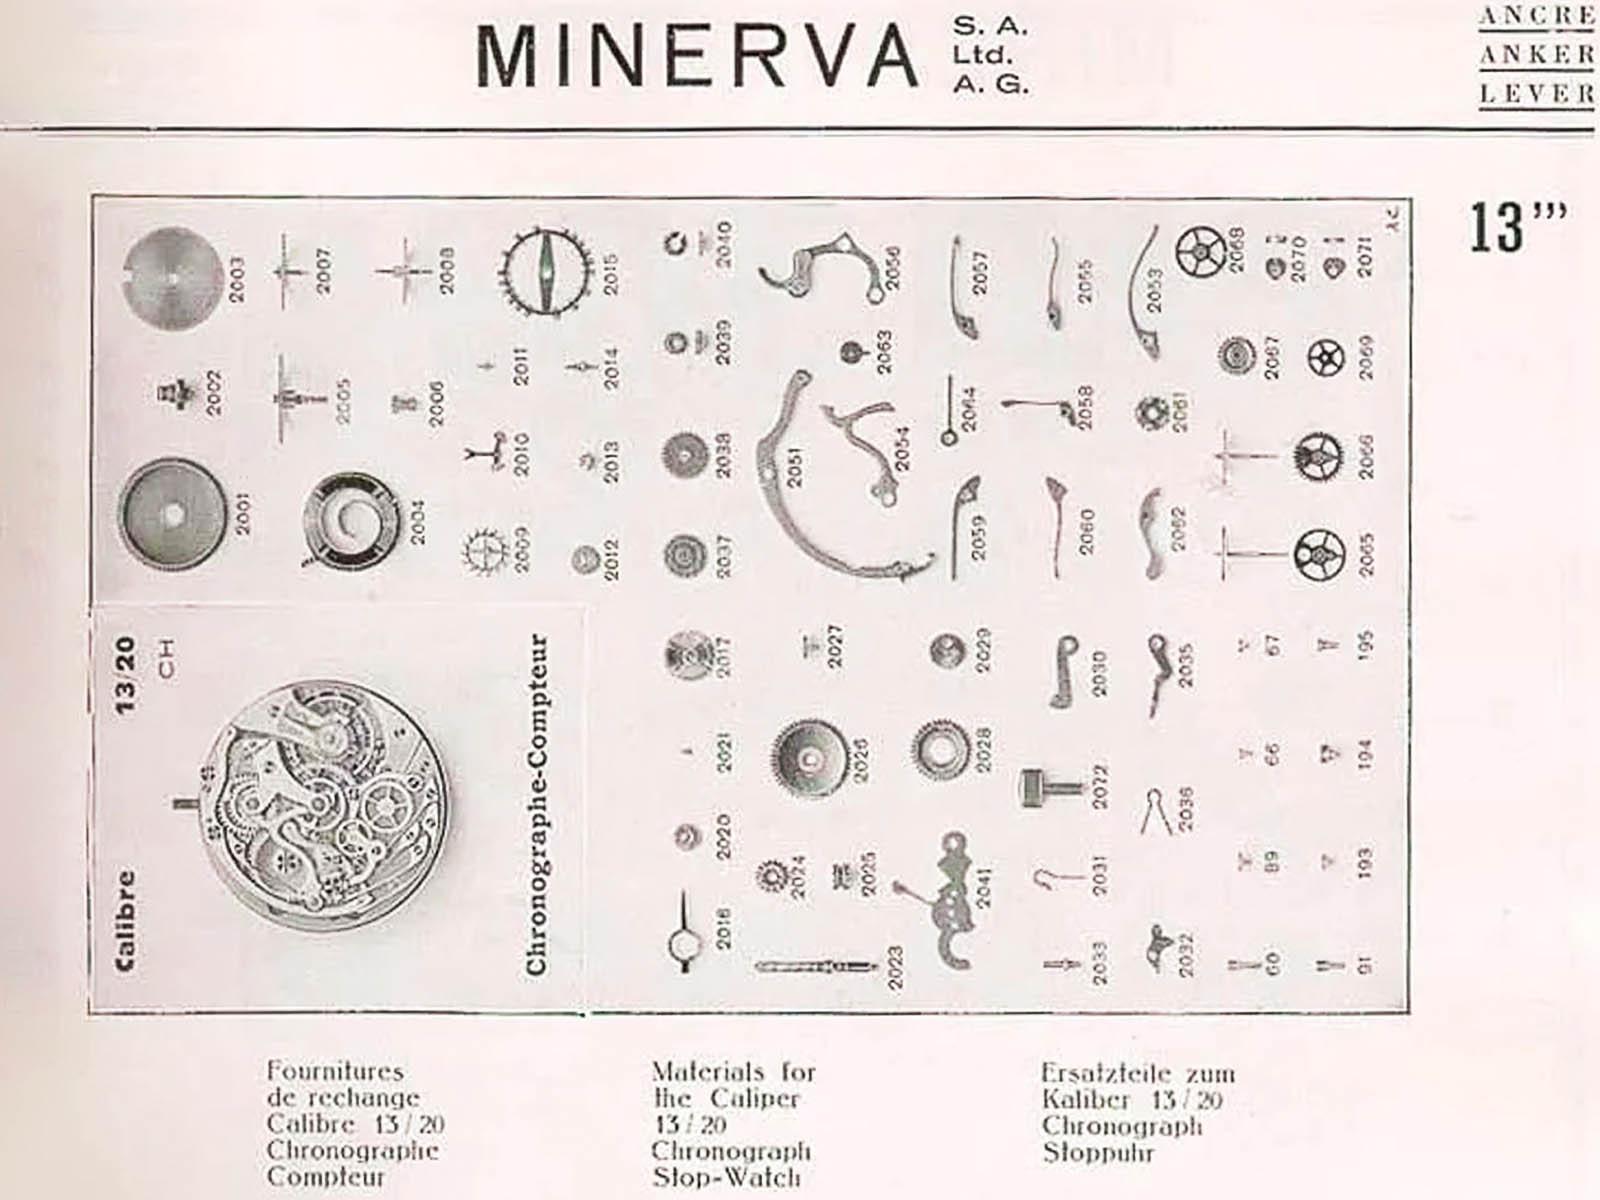 the-minerva-story-9.jpg